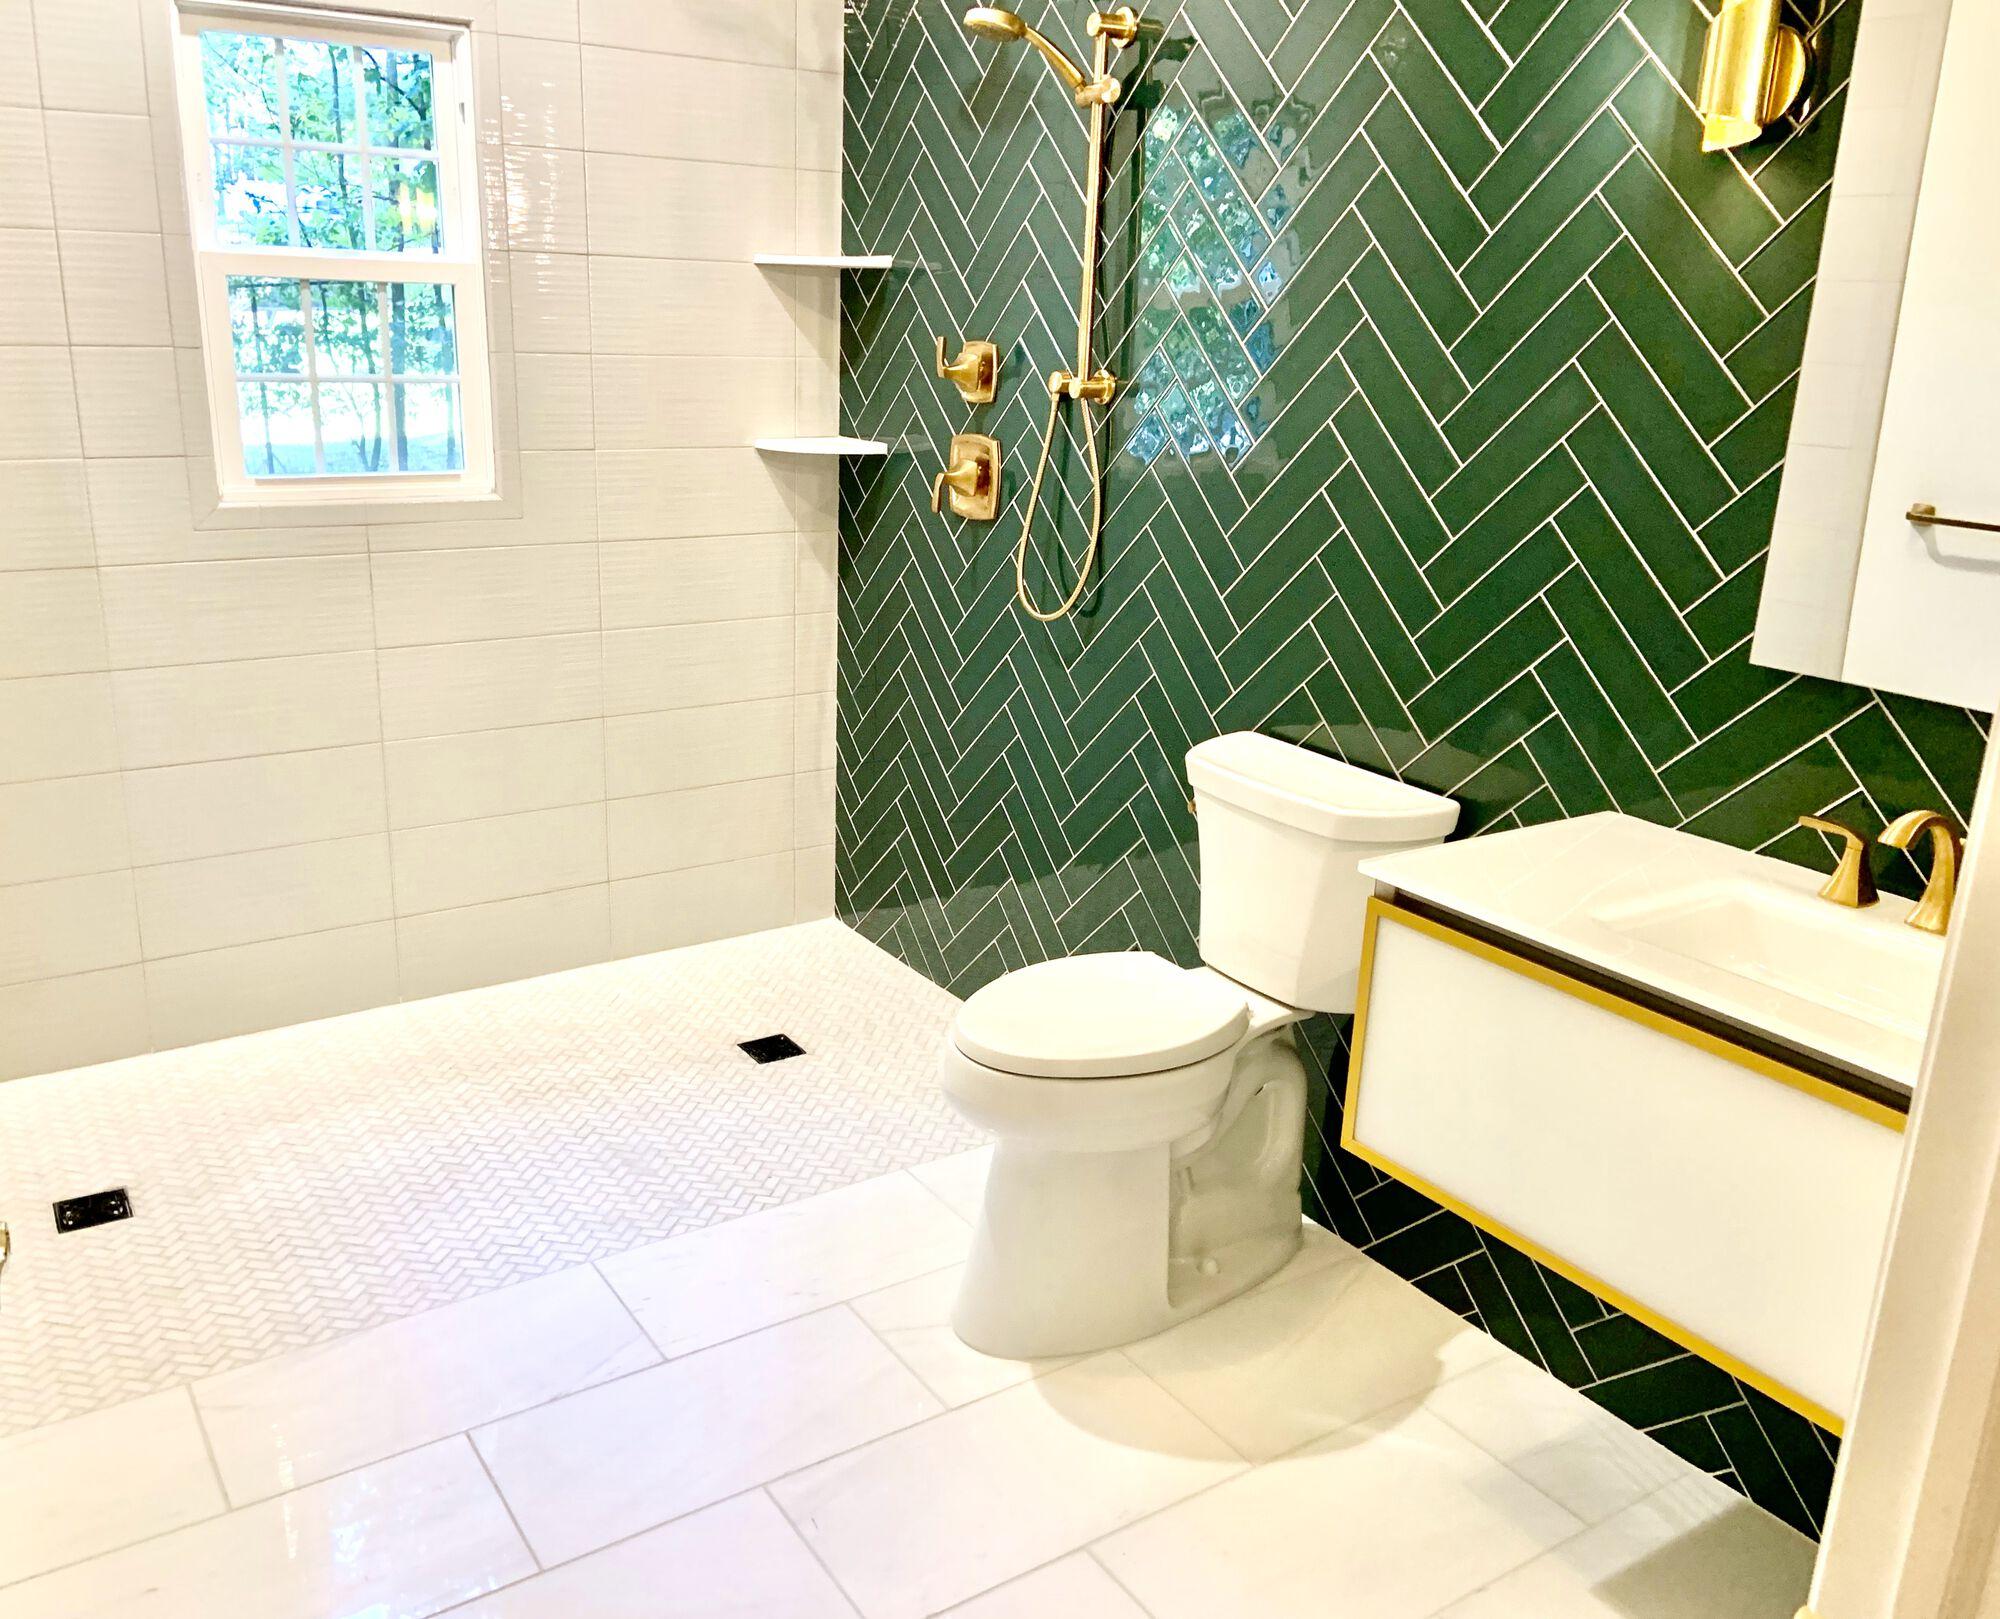 Robern Floating Vanity with Glass Top, Robert Medicine Cabinet, Moen Faucets, Glass Tile Herringbone Design in Greenbrook, Middlesex County NJ